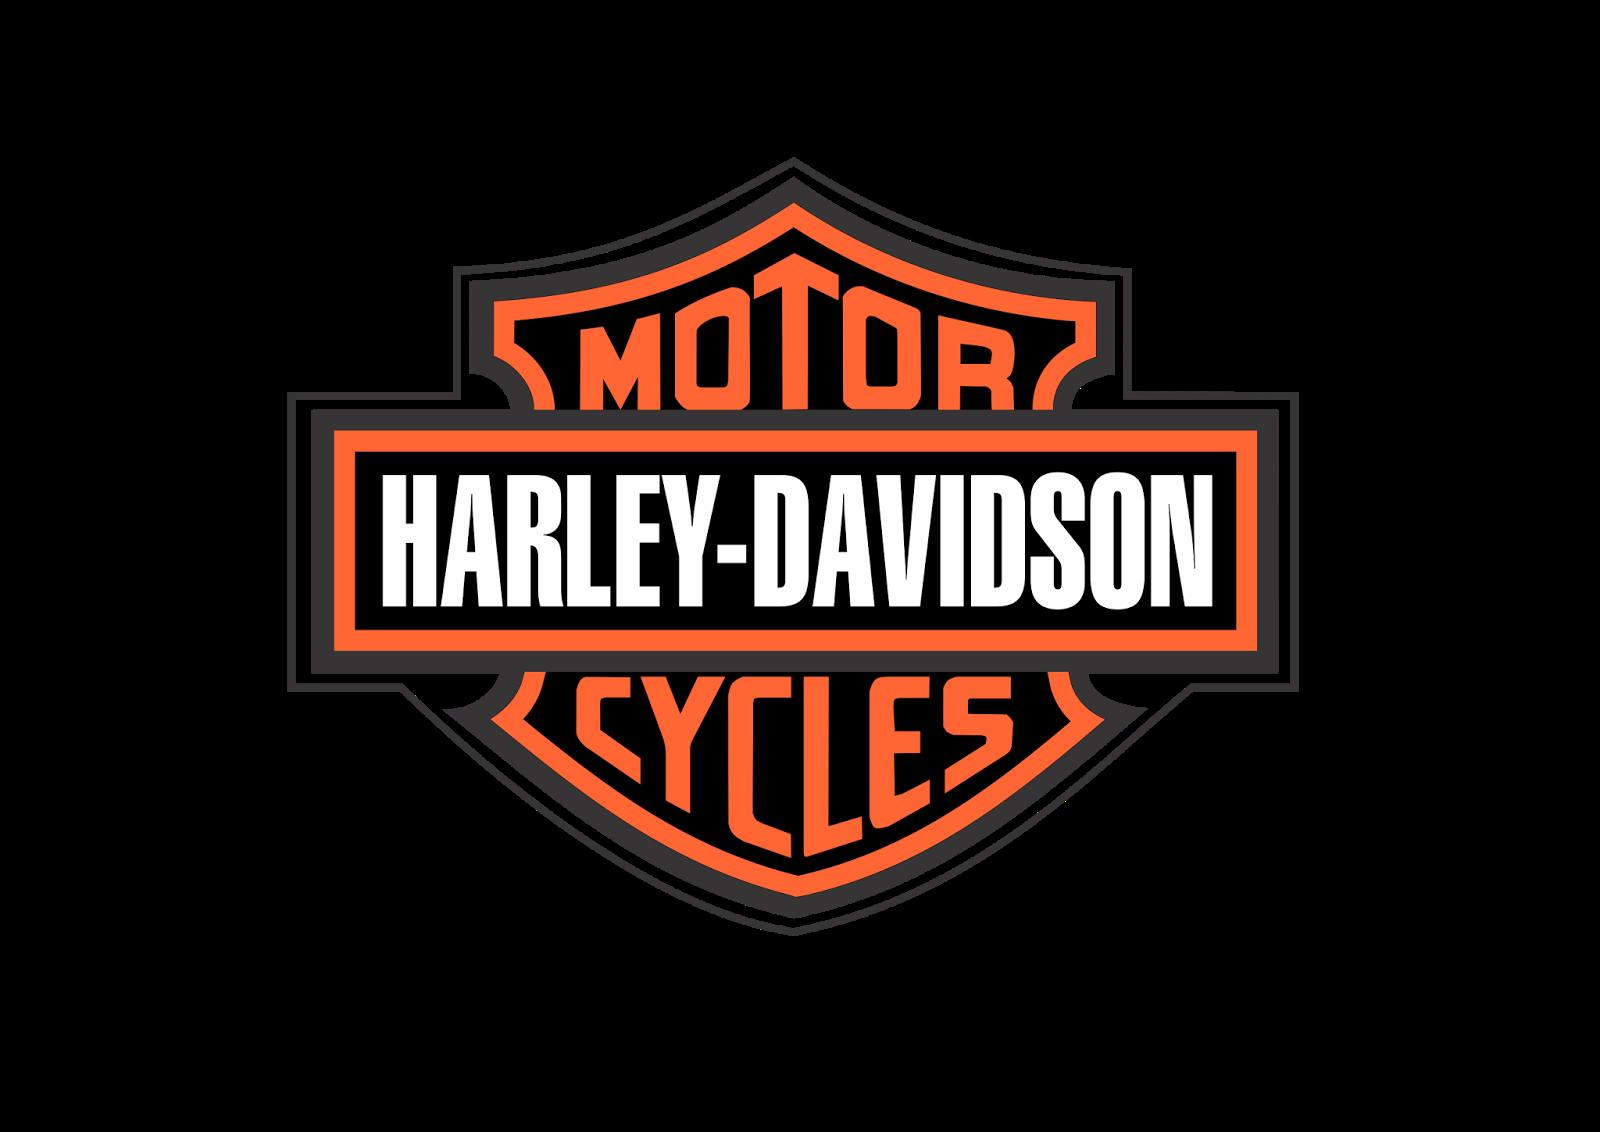 Related Image Harley Davidson Logo Harley Davidson Harley